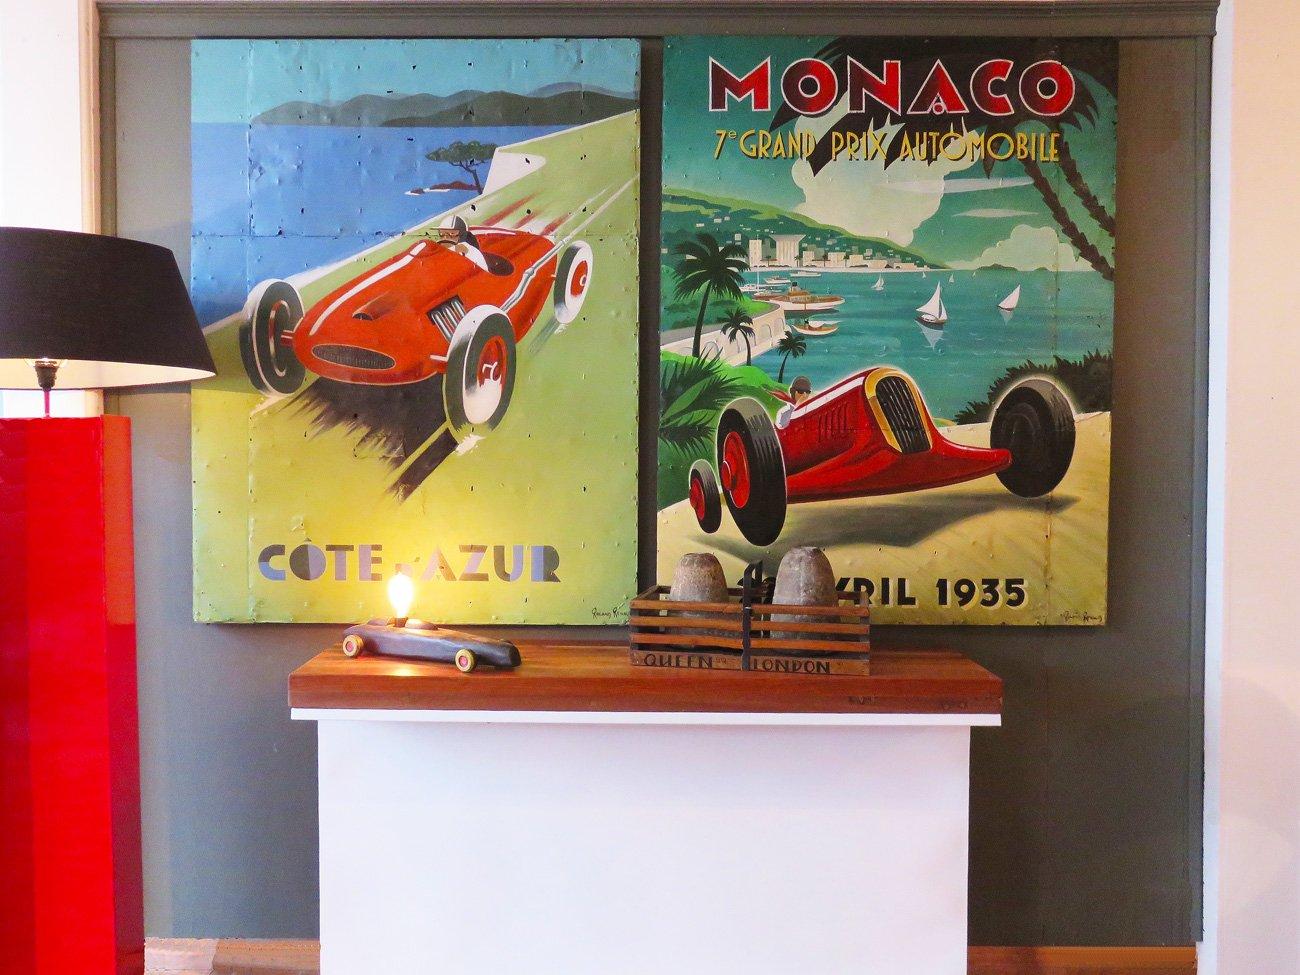 Monaco Grand Prix vintage posters